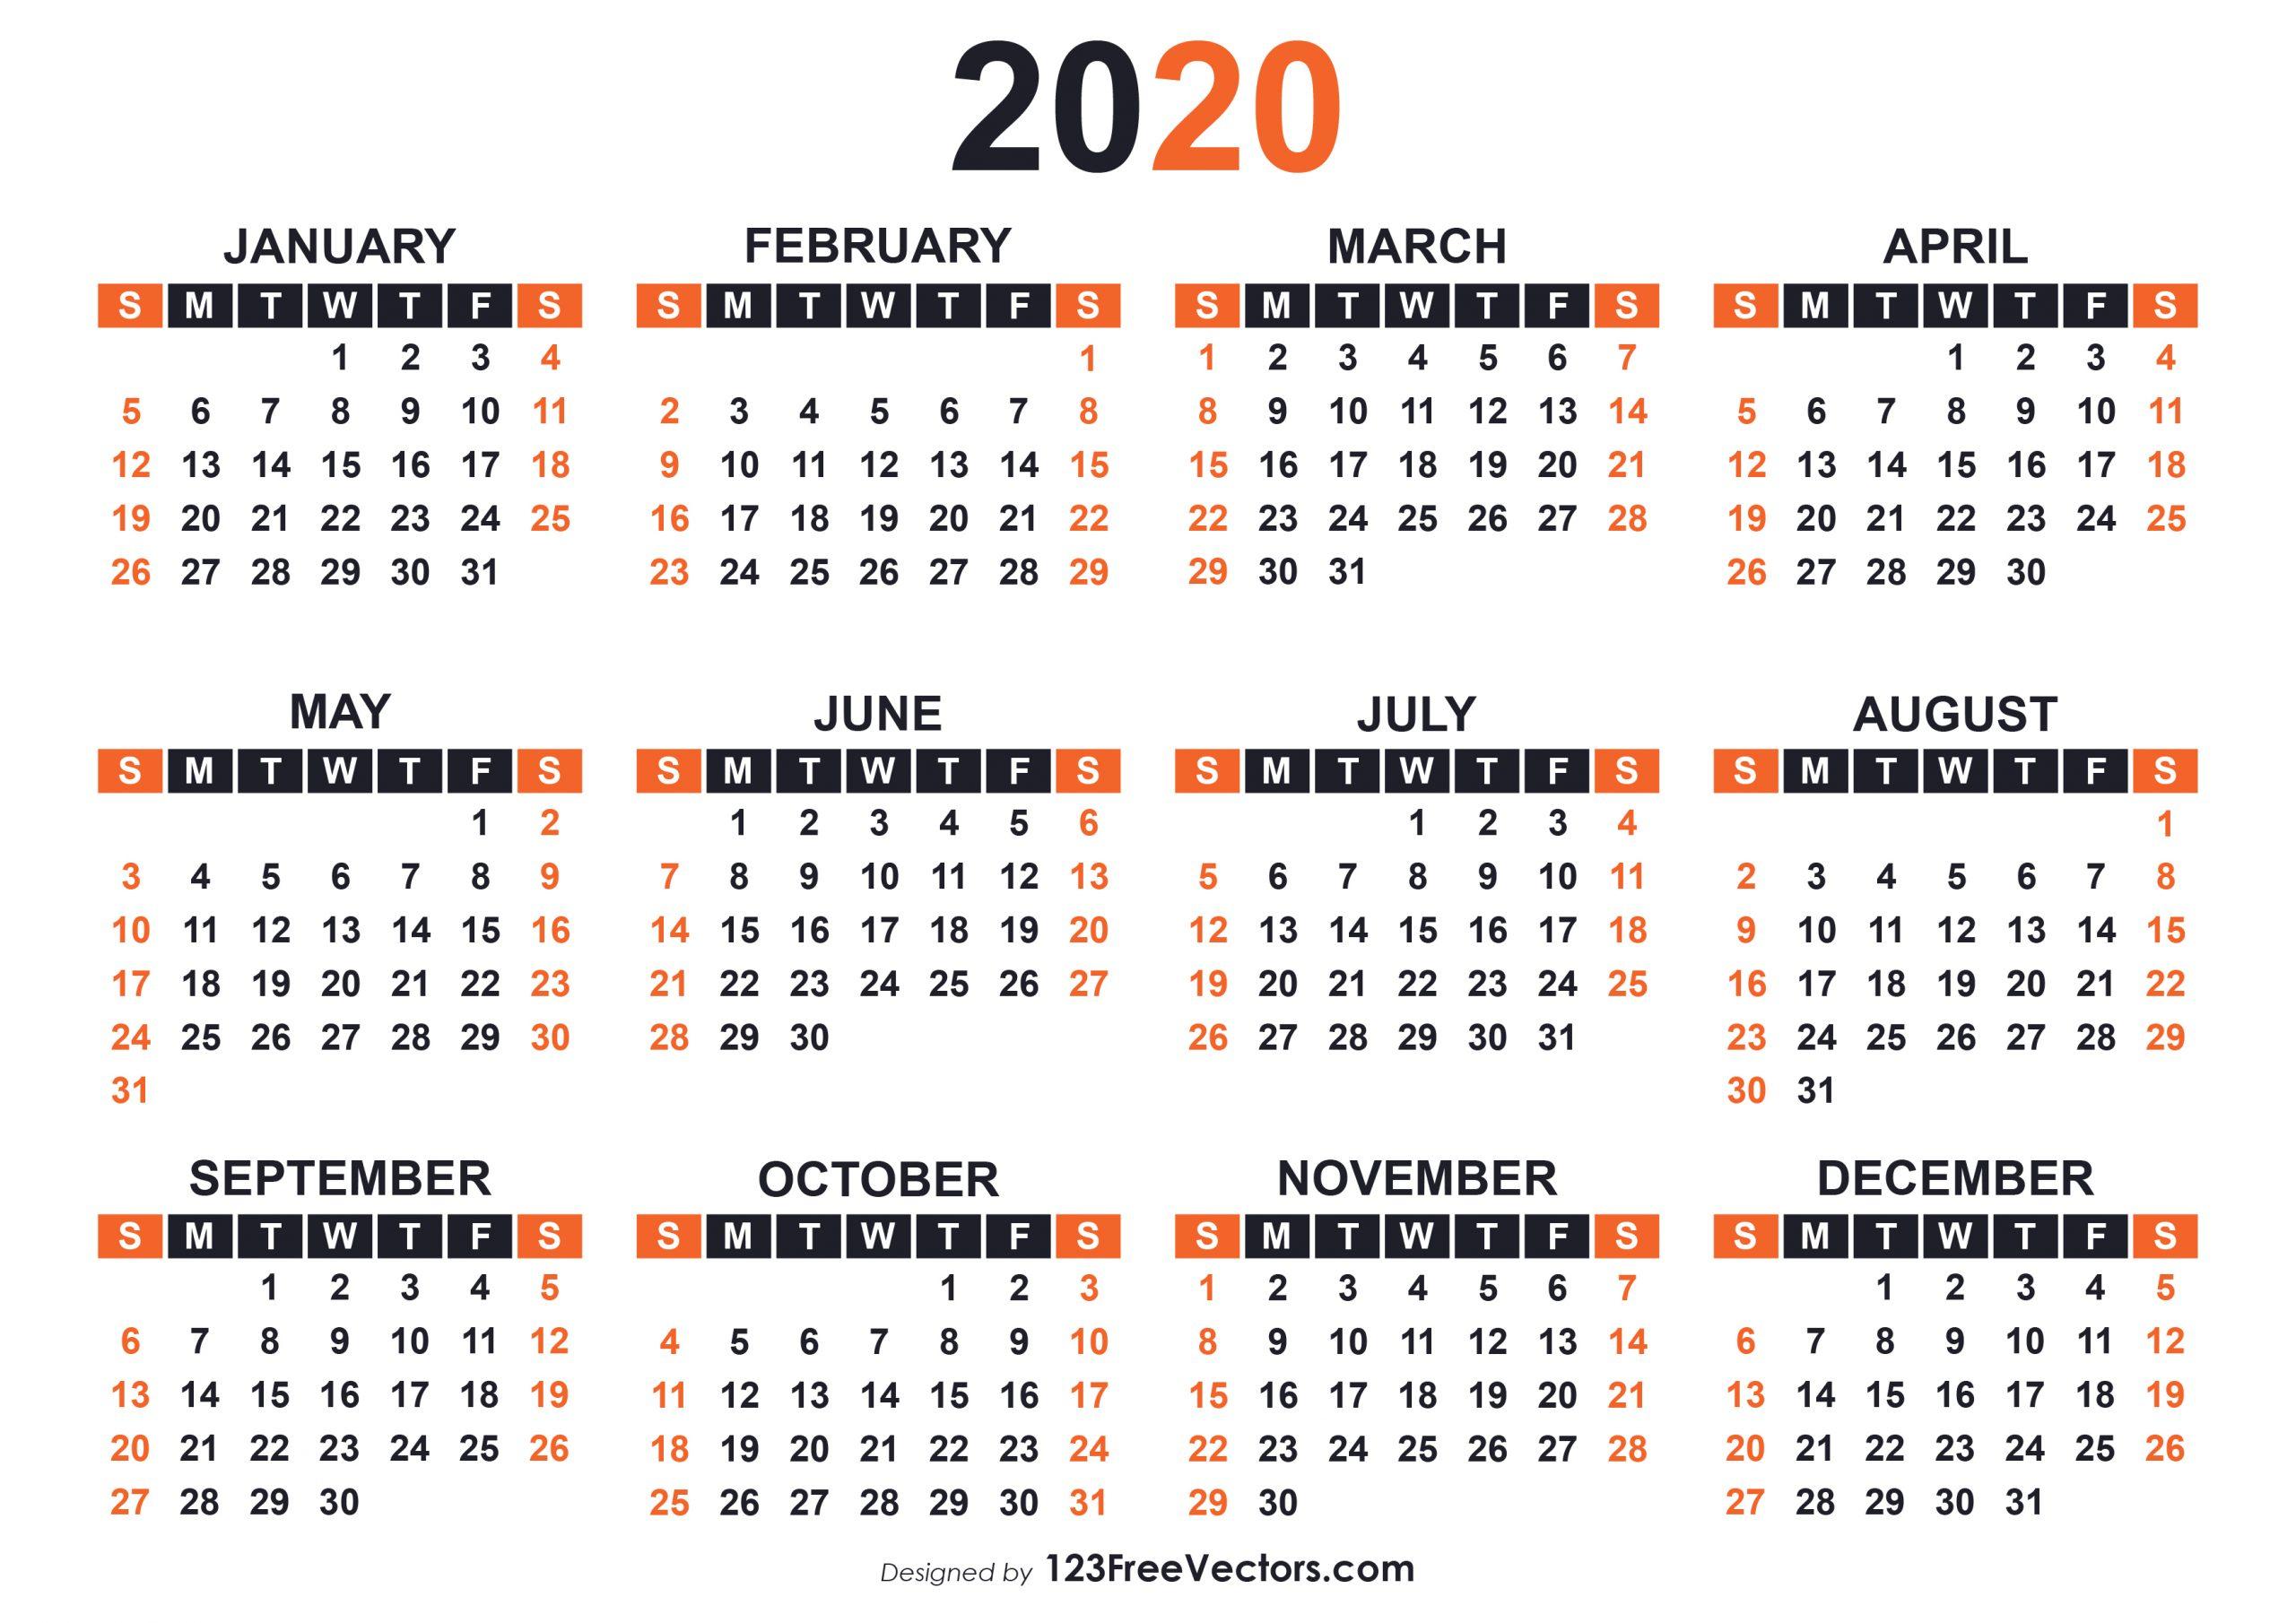 2021 Wv Rut Prediction Calendar Printables Free Blank